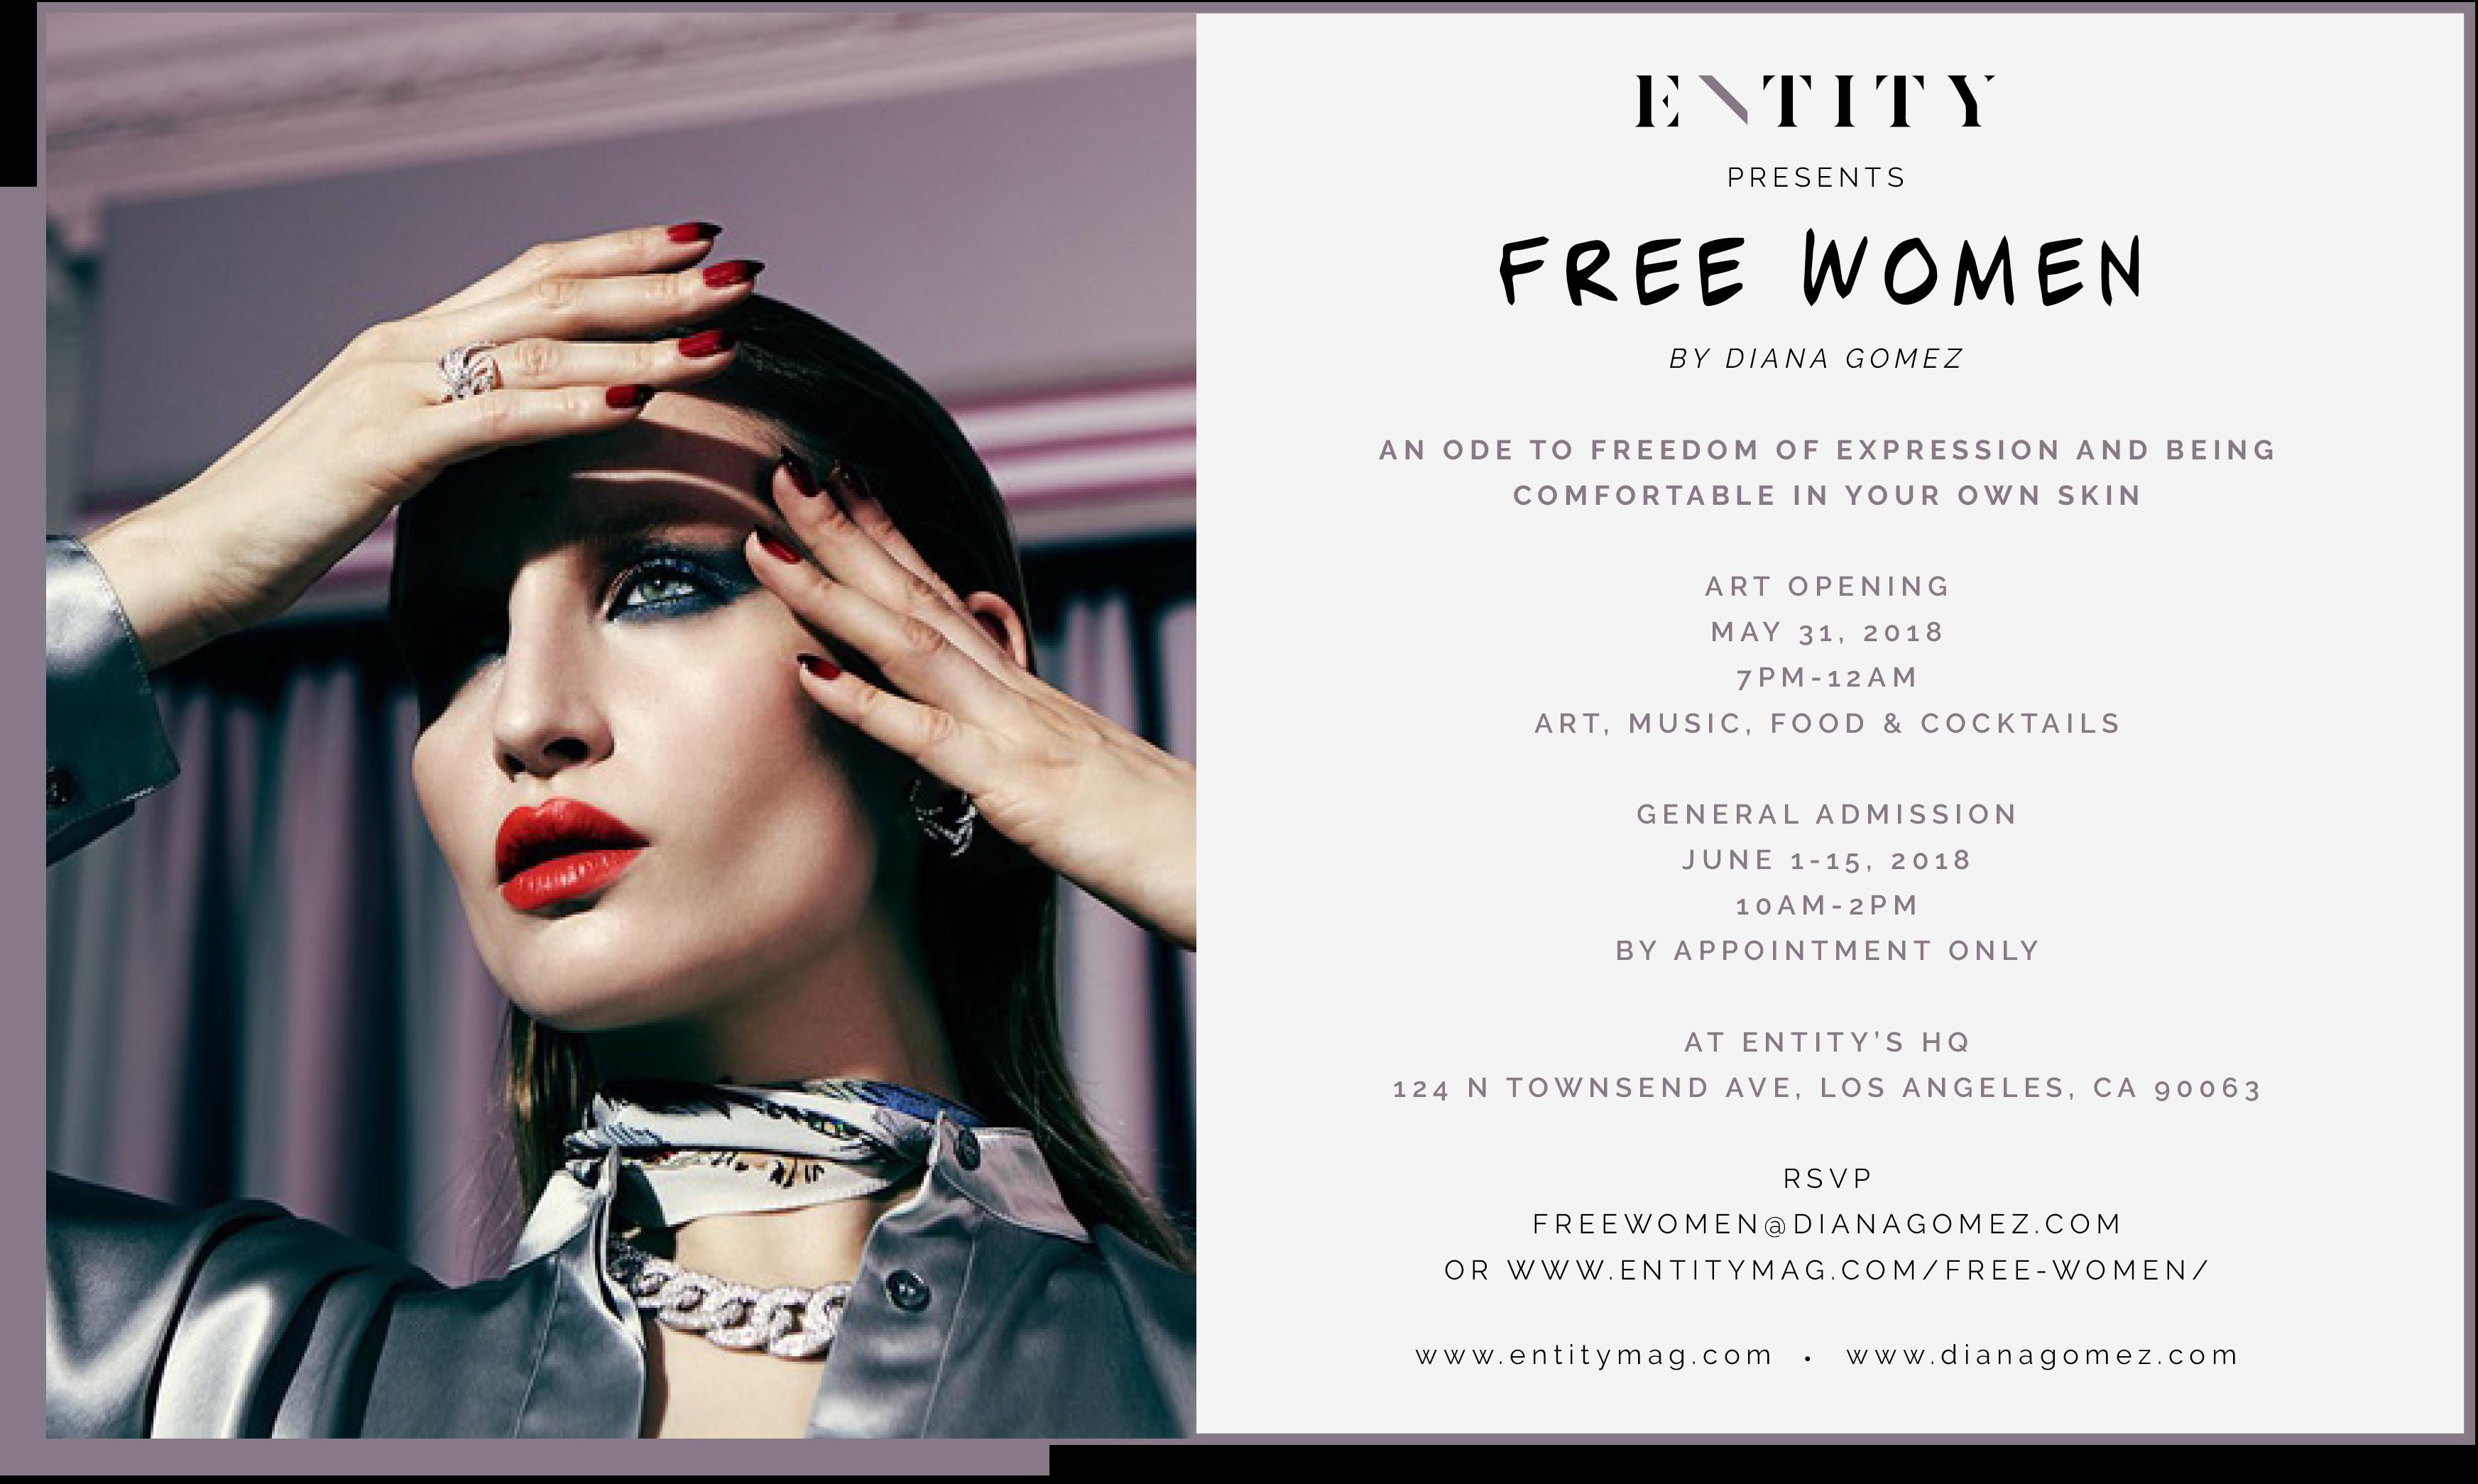 ENTITY x Free Women Art Exhibit